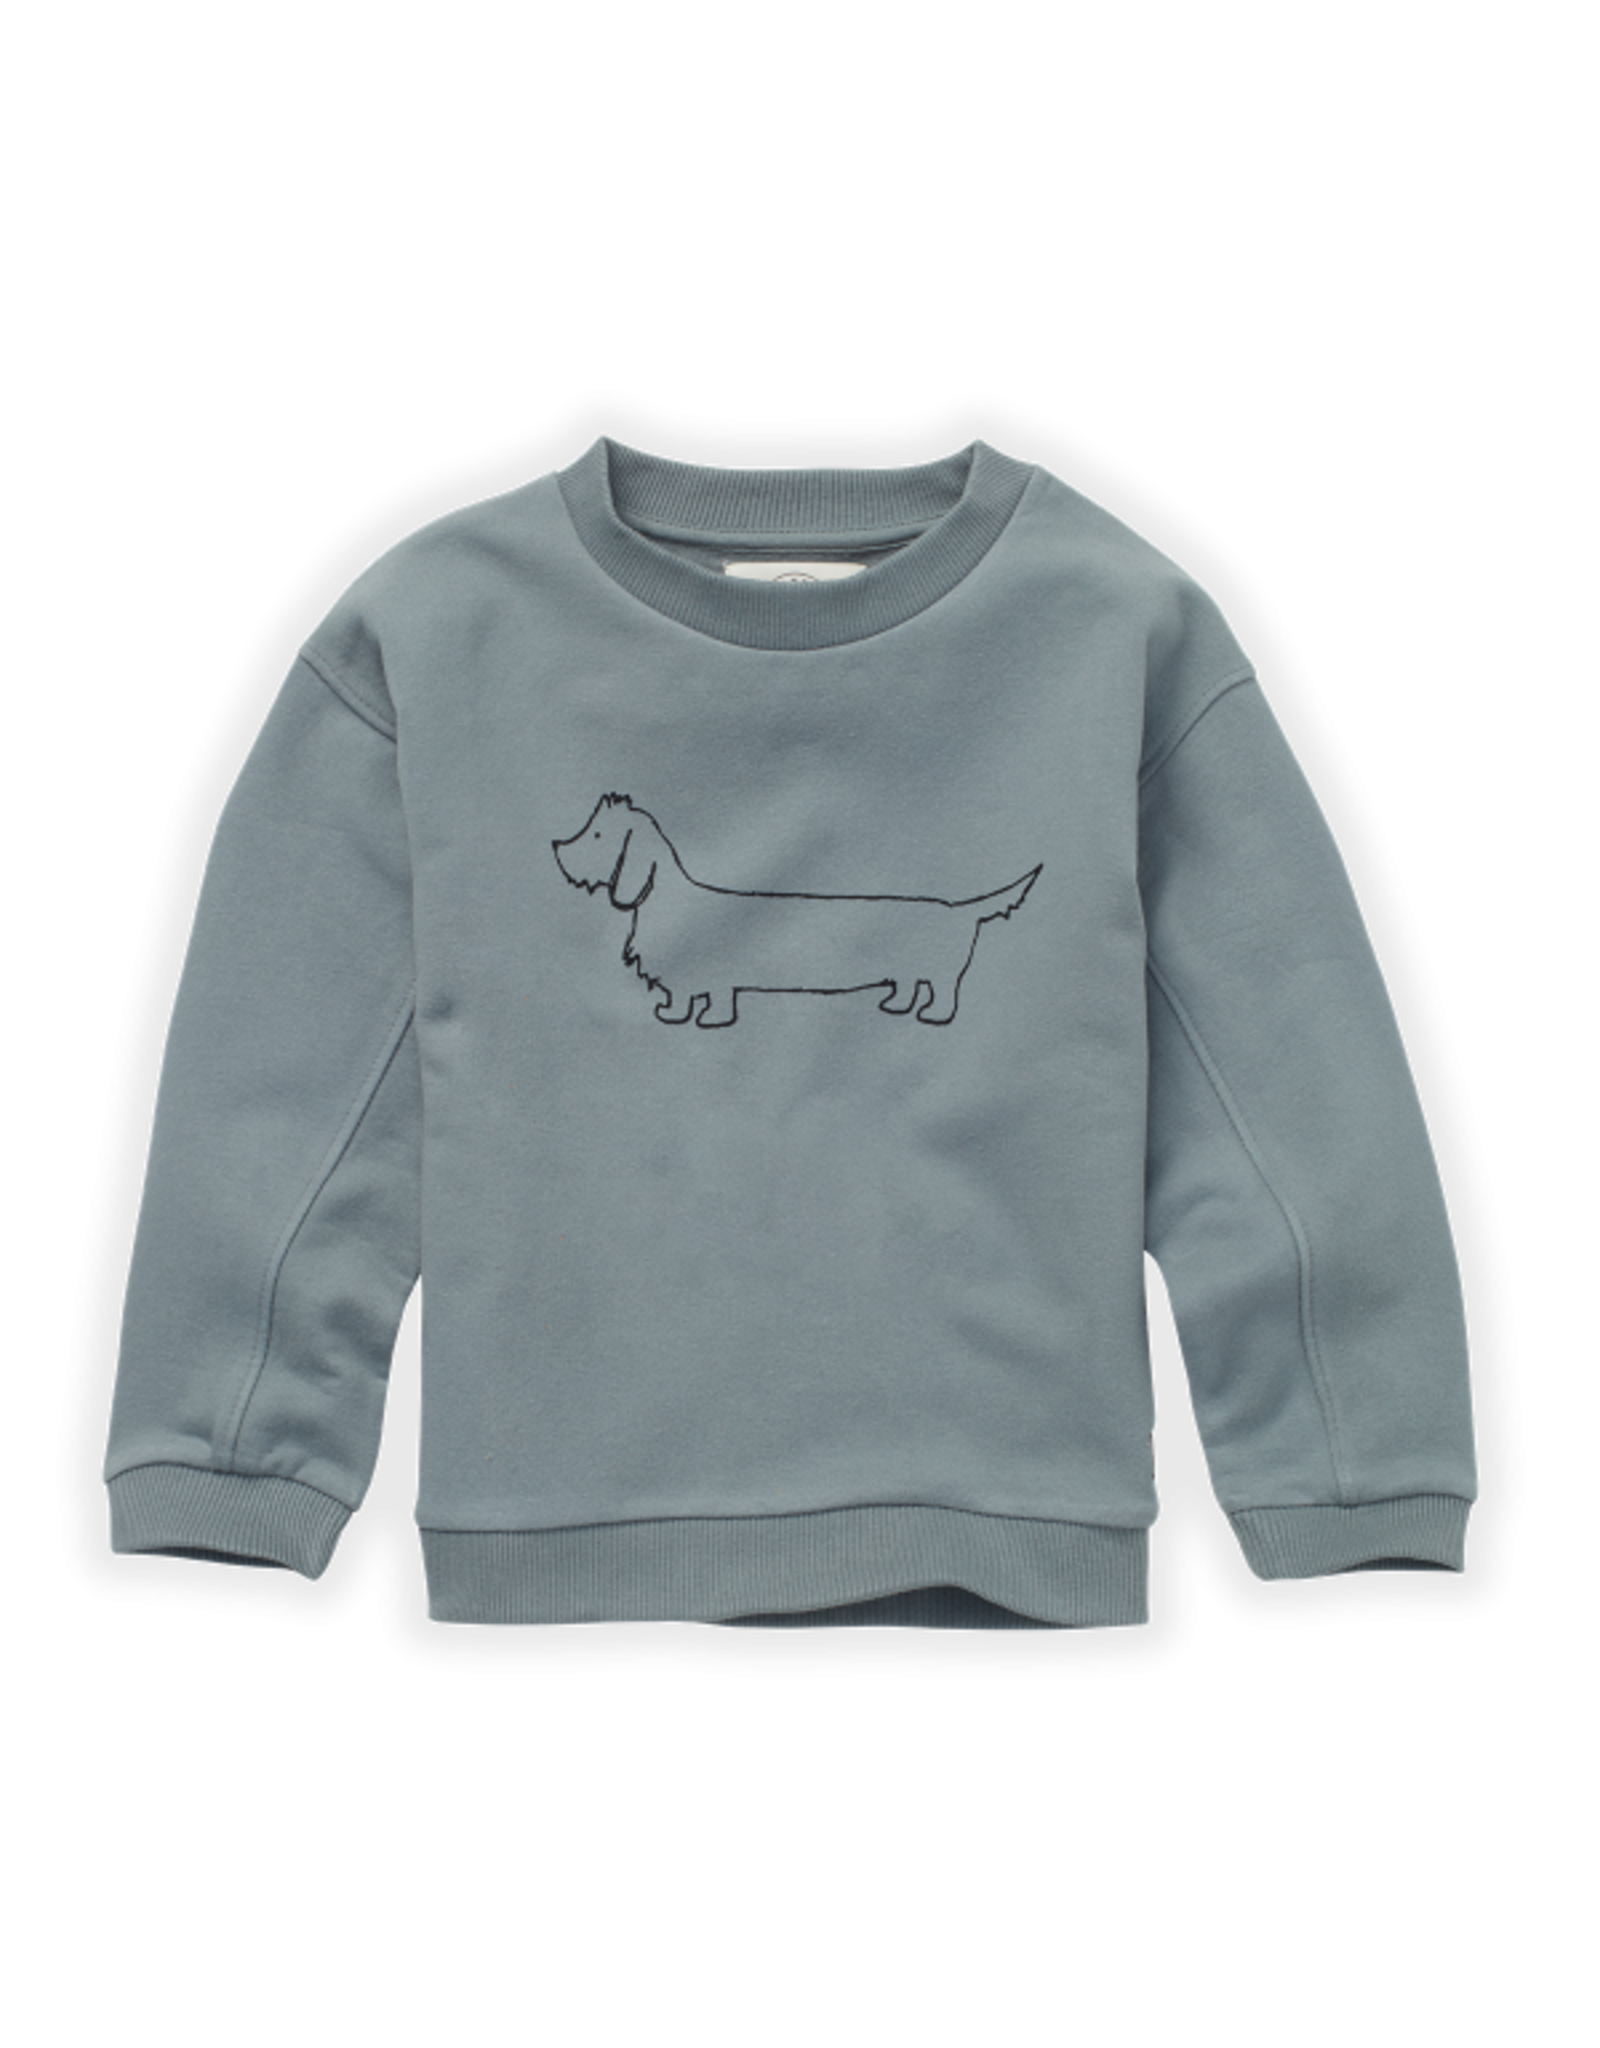 Sproet & Sprout Sproet & Sprout Sweatshirt Sausage Dog Lake Blue